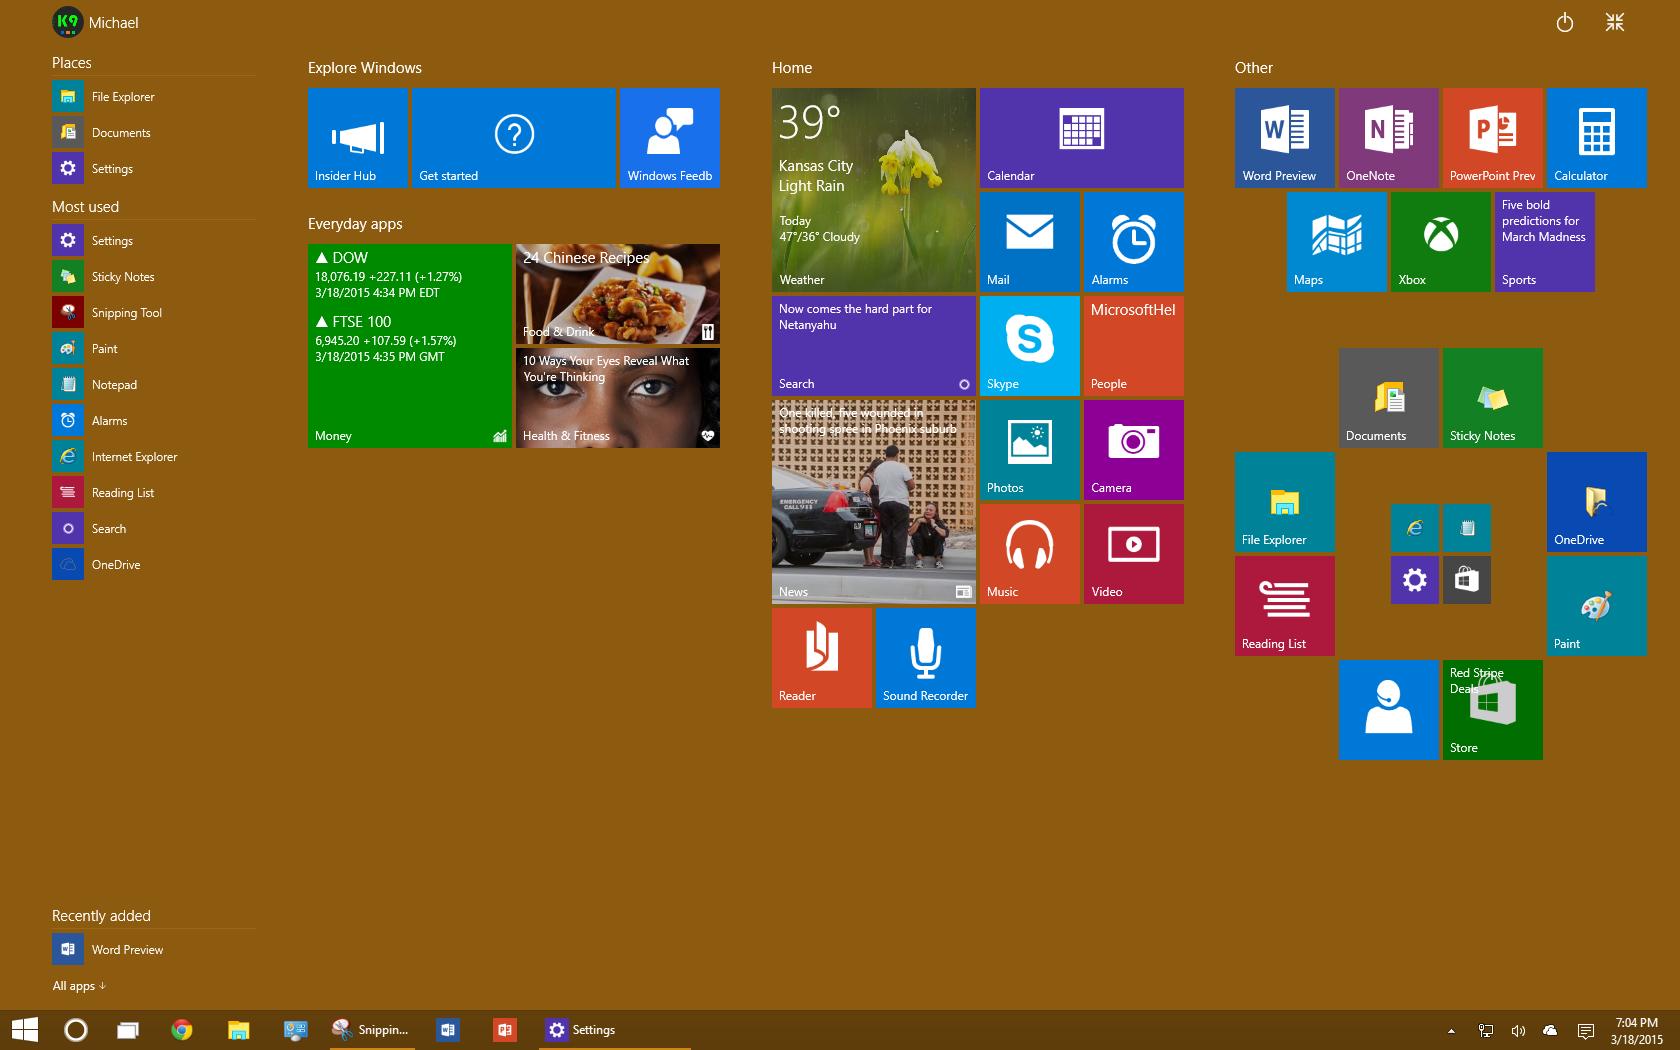 Playing Around with Windows 10